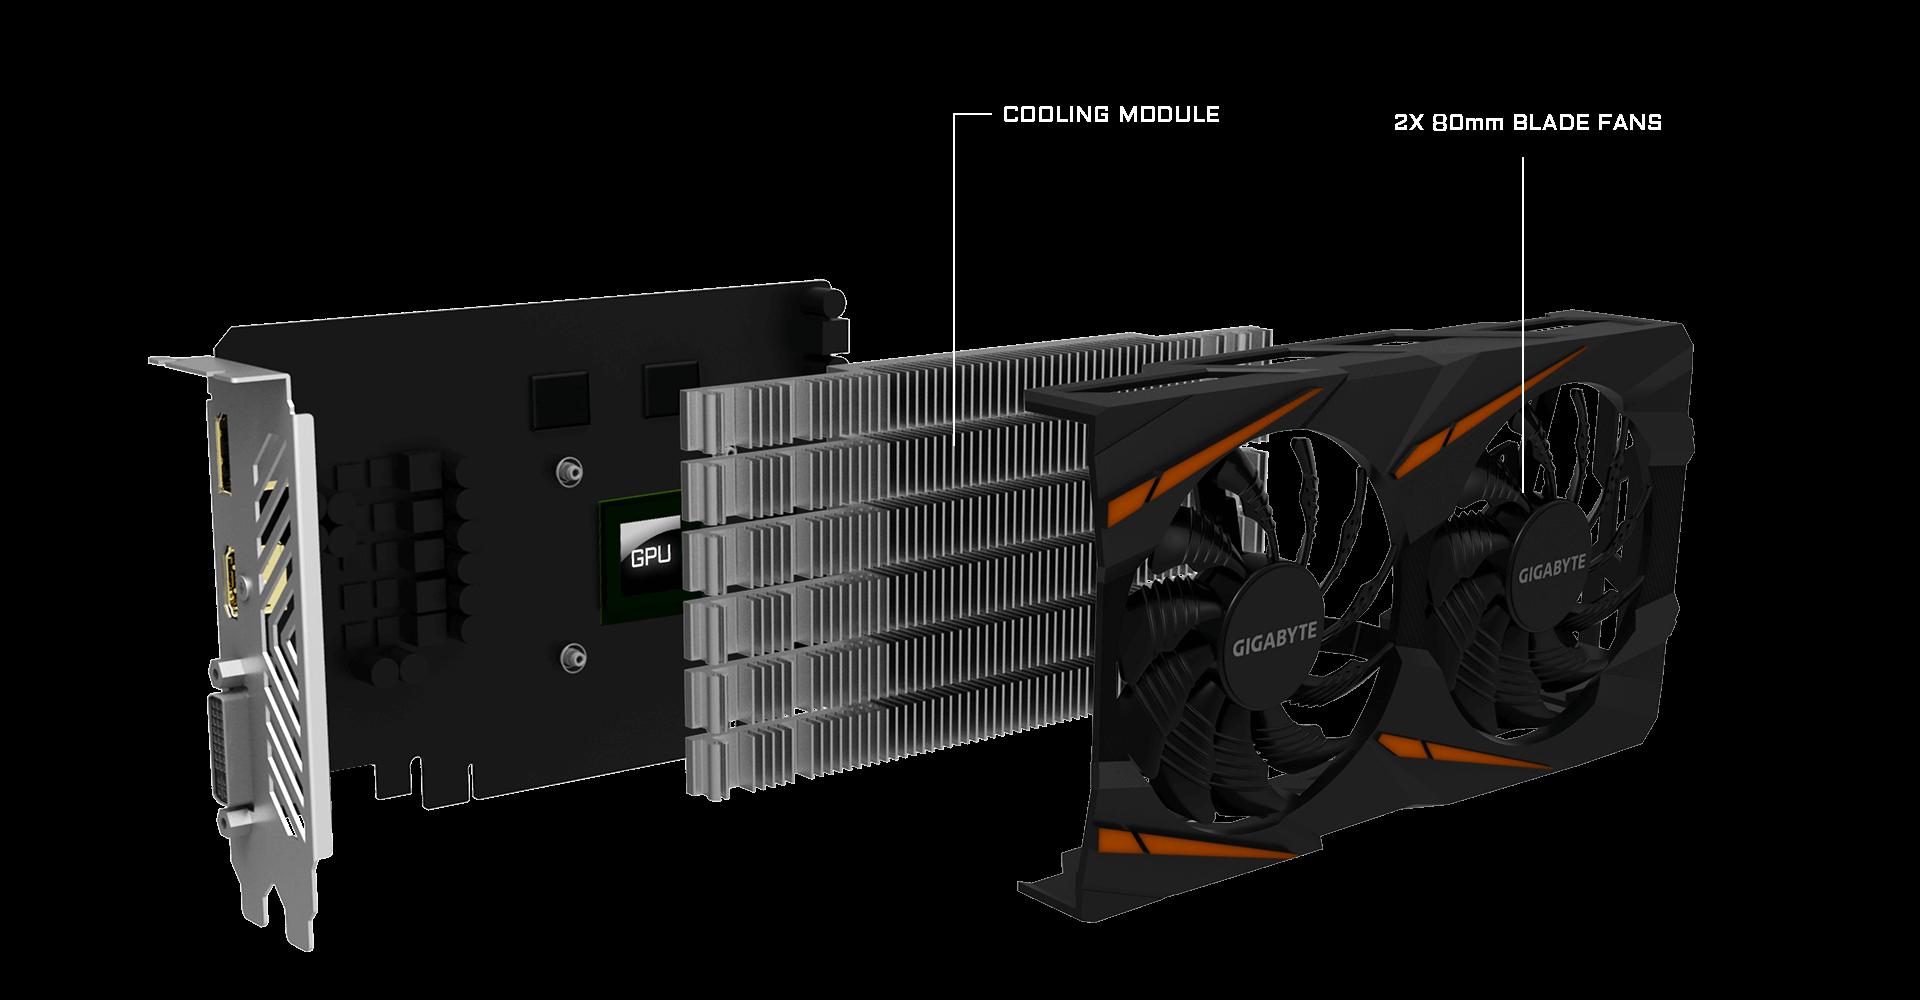 REV 2 GV-RX560GAMING SCHEDA VIDEO VGA Gigabyte AMD Radeon RX 560 Gaming OC 4GD